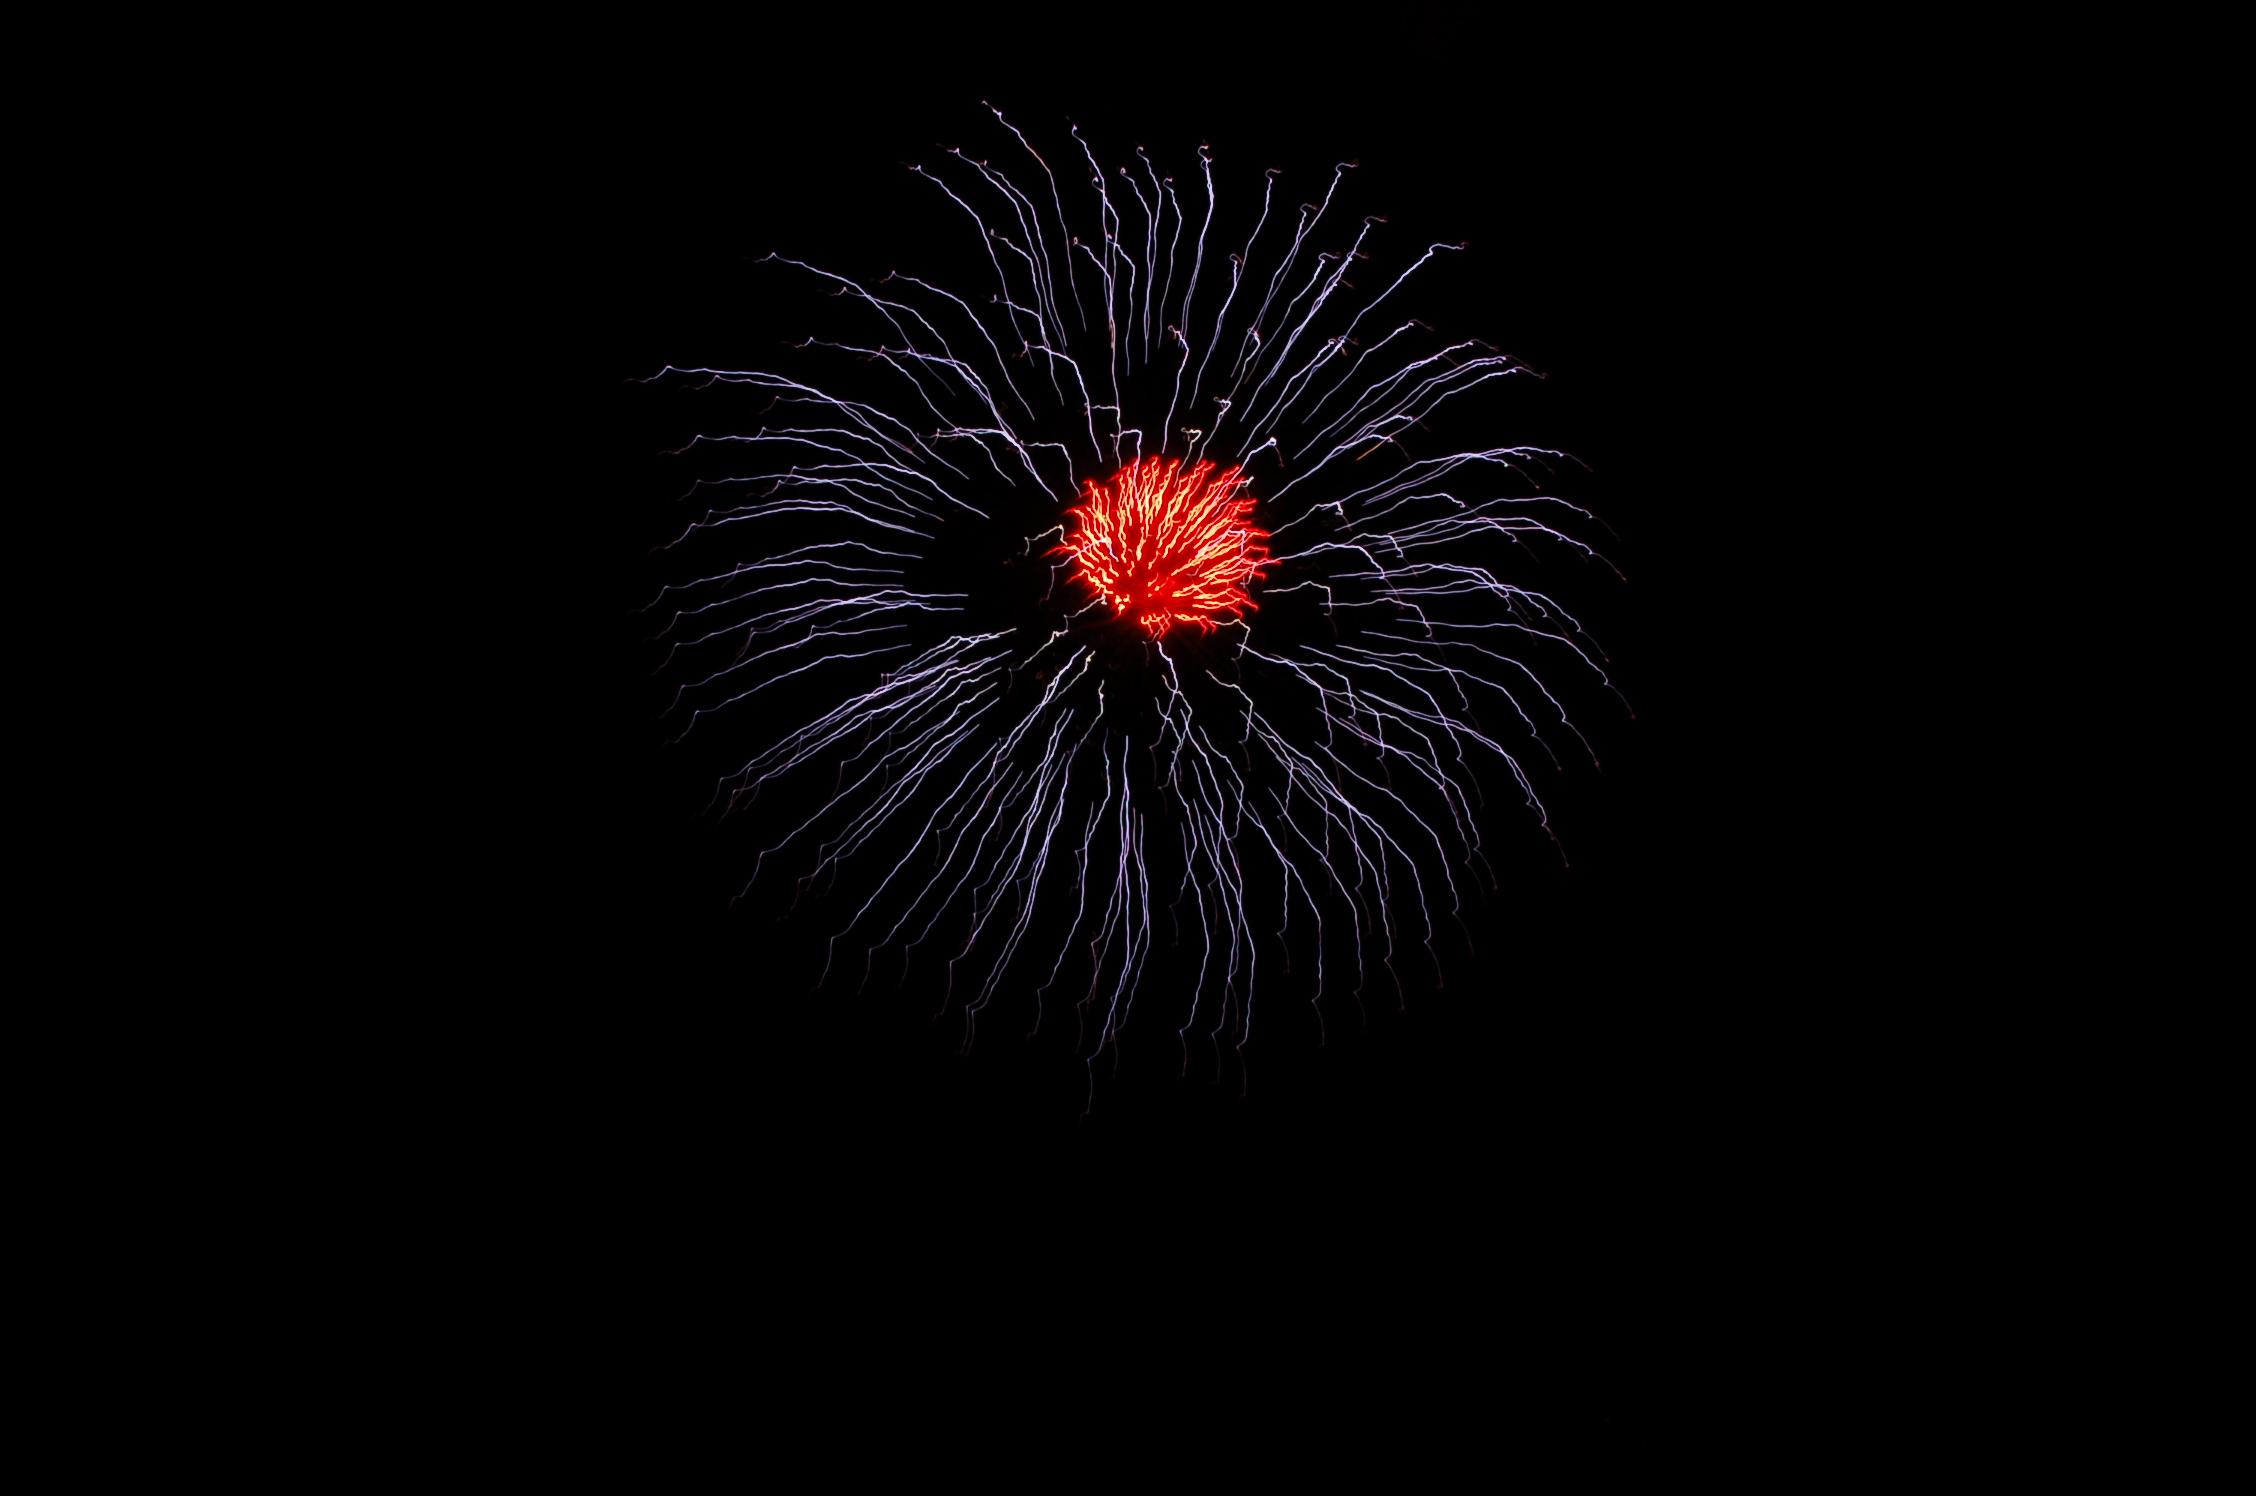 FA_Fireworks_Fireworks009.JPG